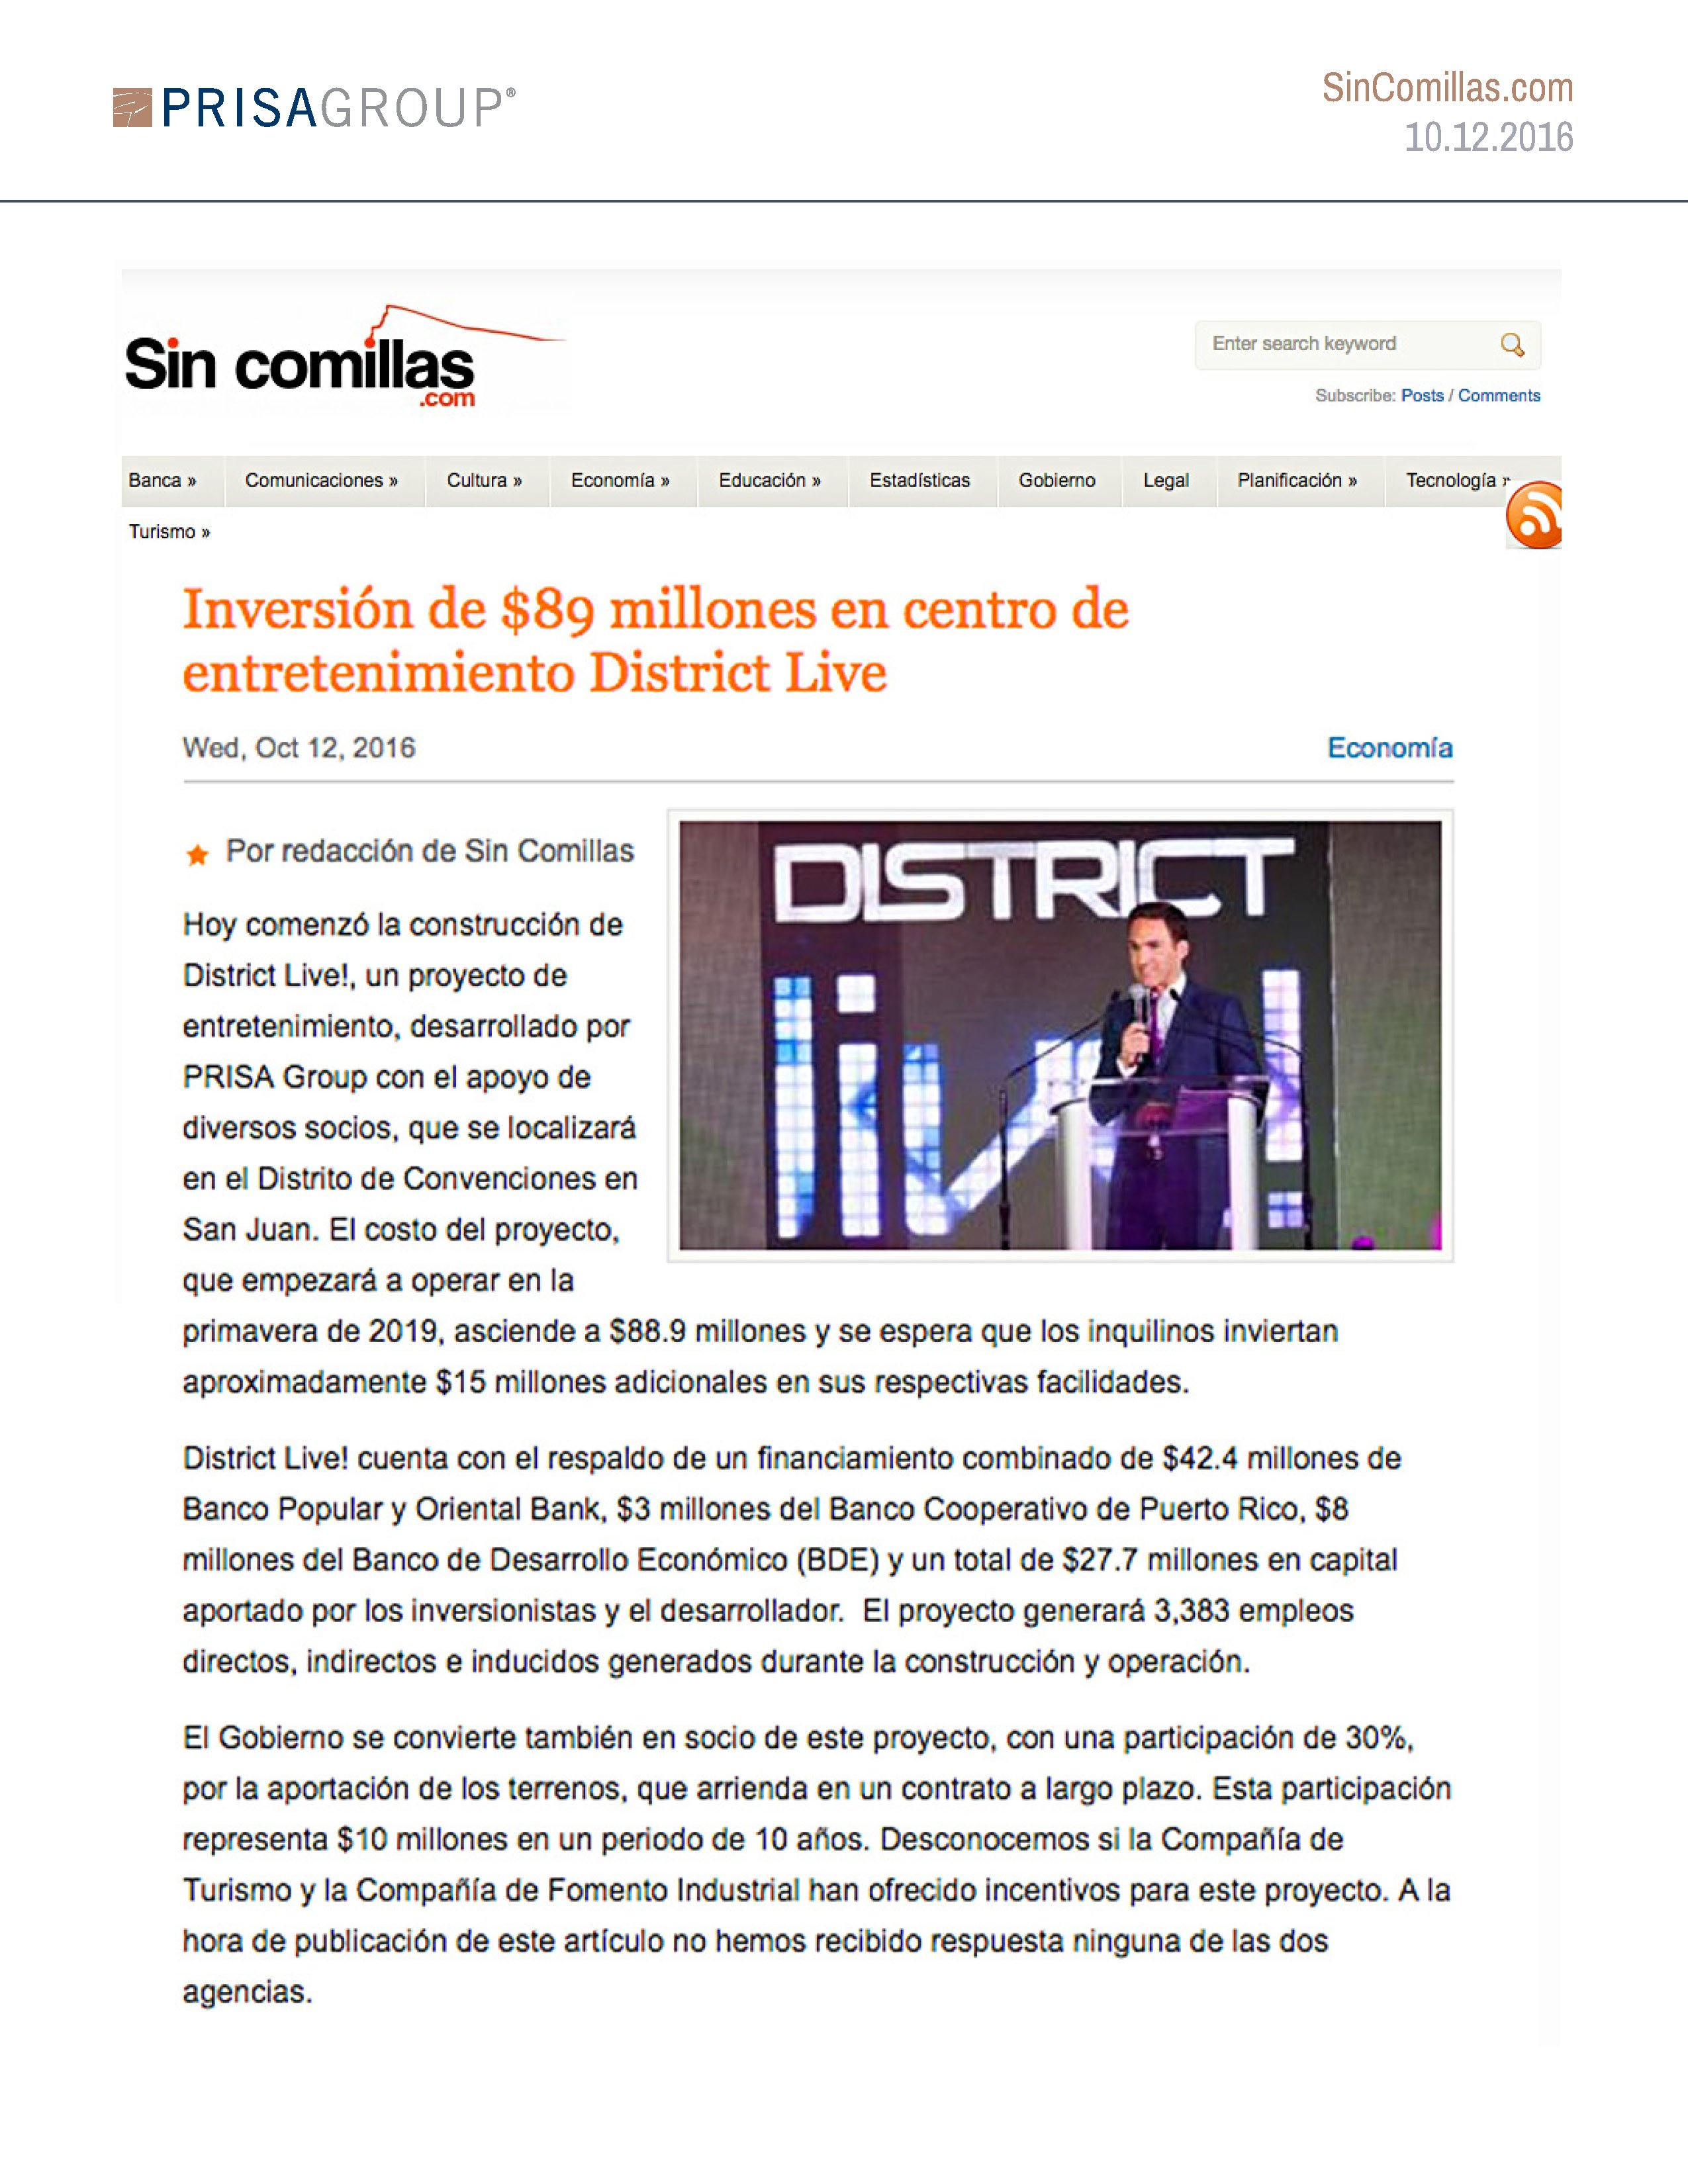 sincomillas-com-10-12-2016_page_1